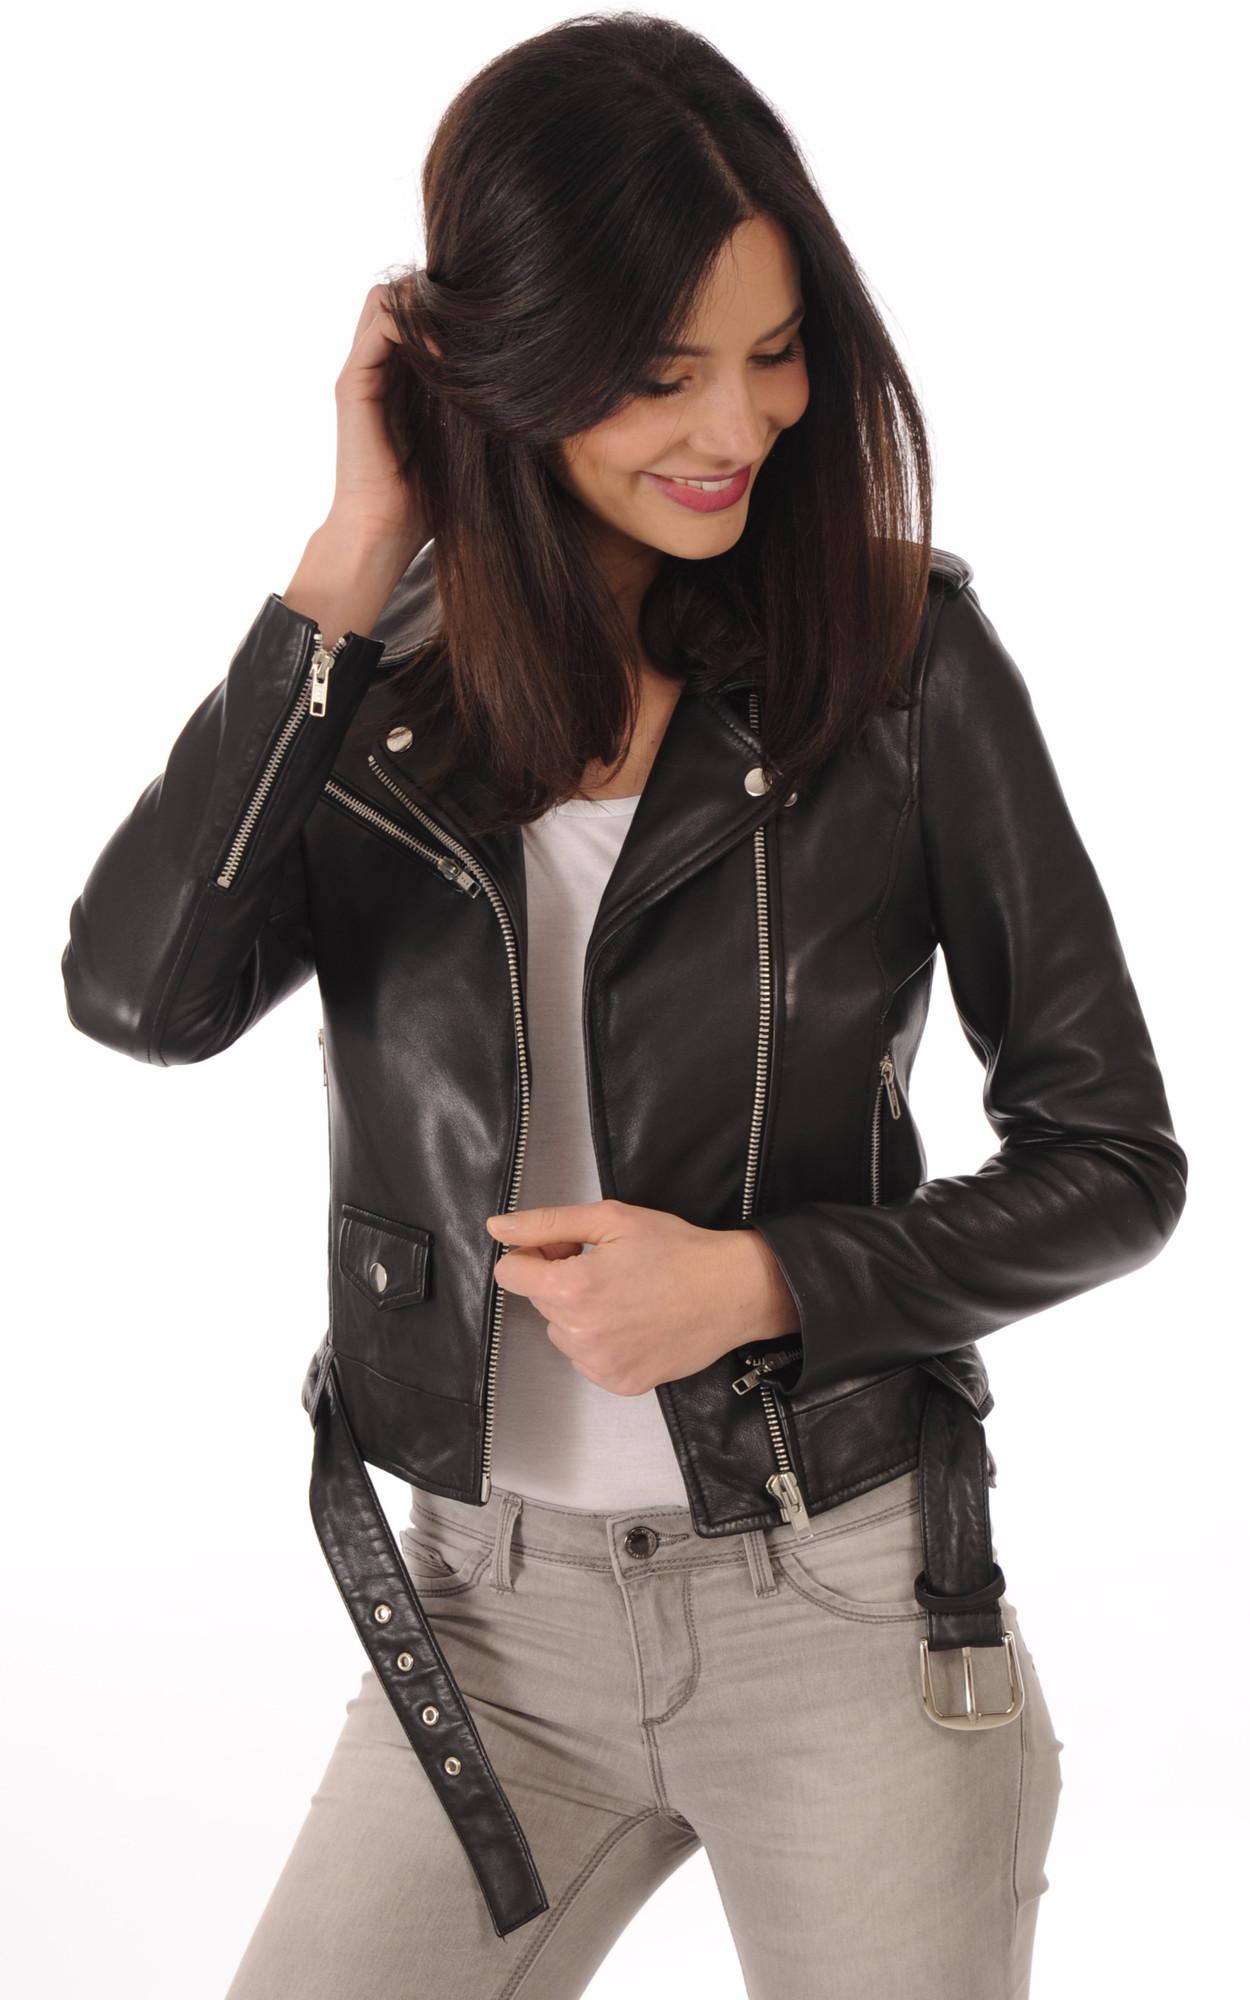 Blouson Perf Rock Girl1